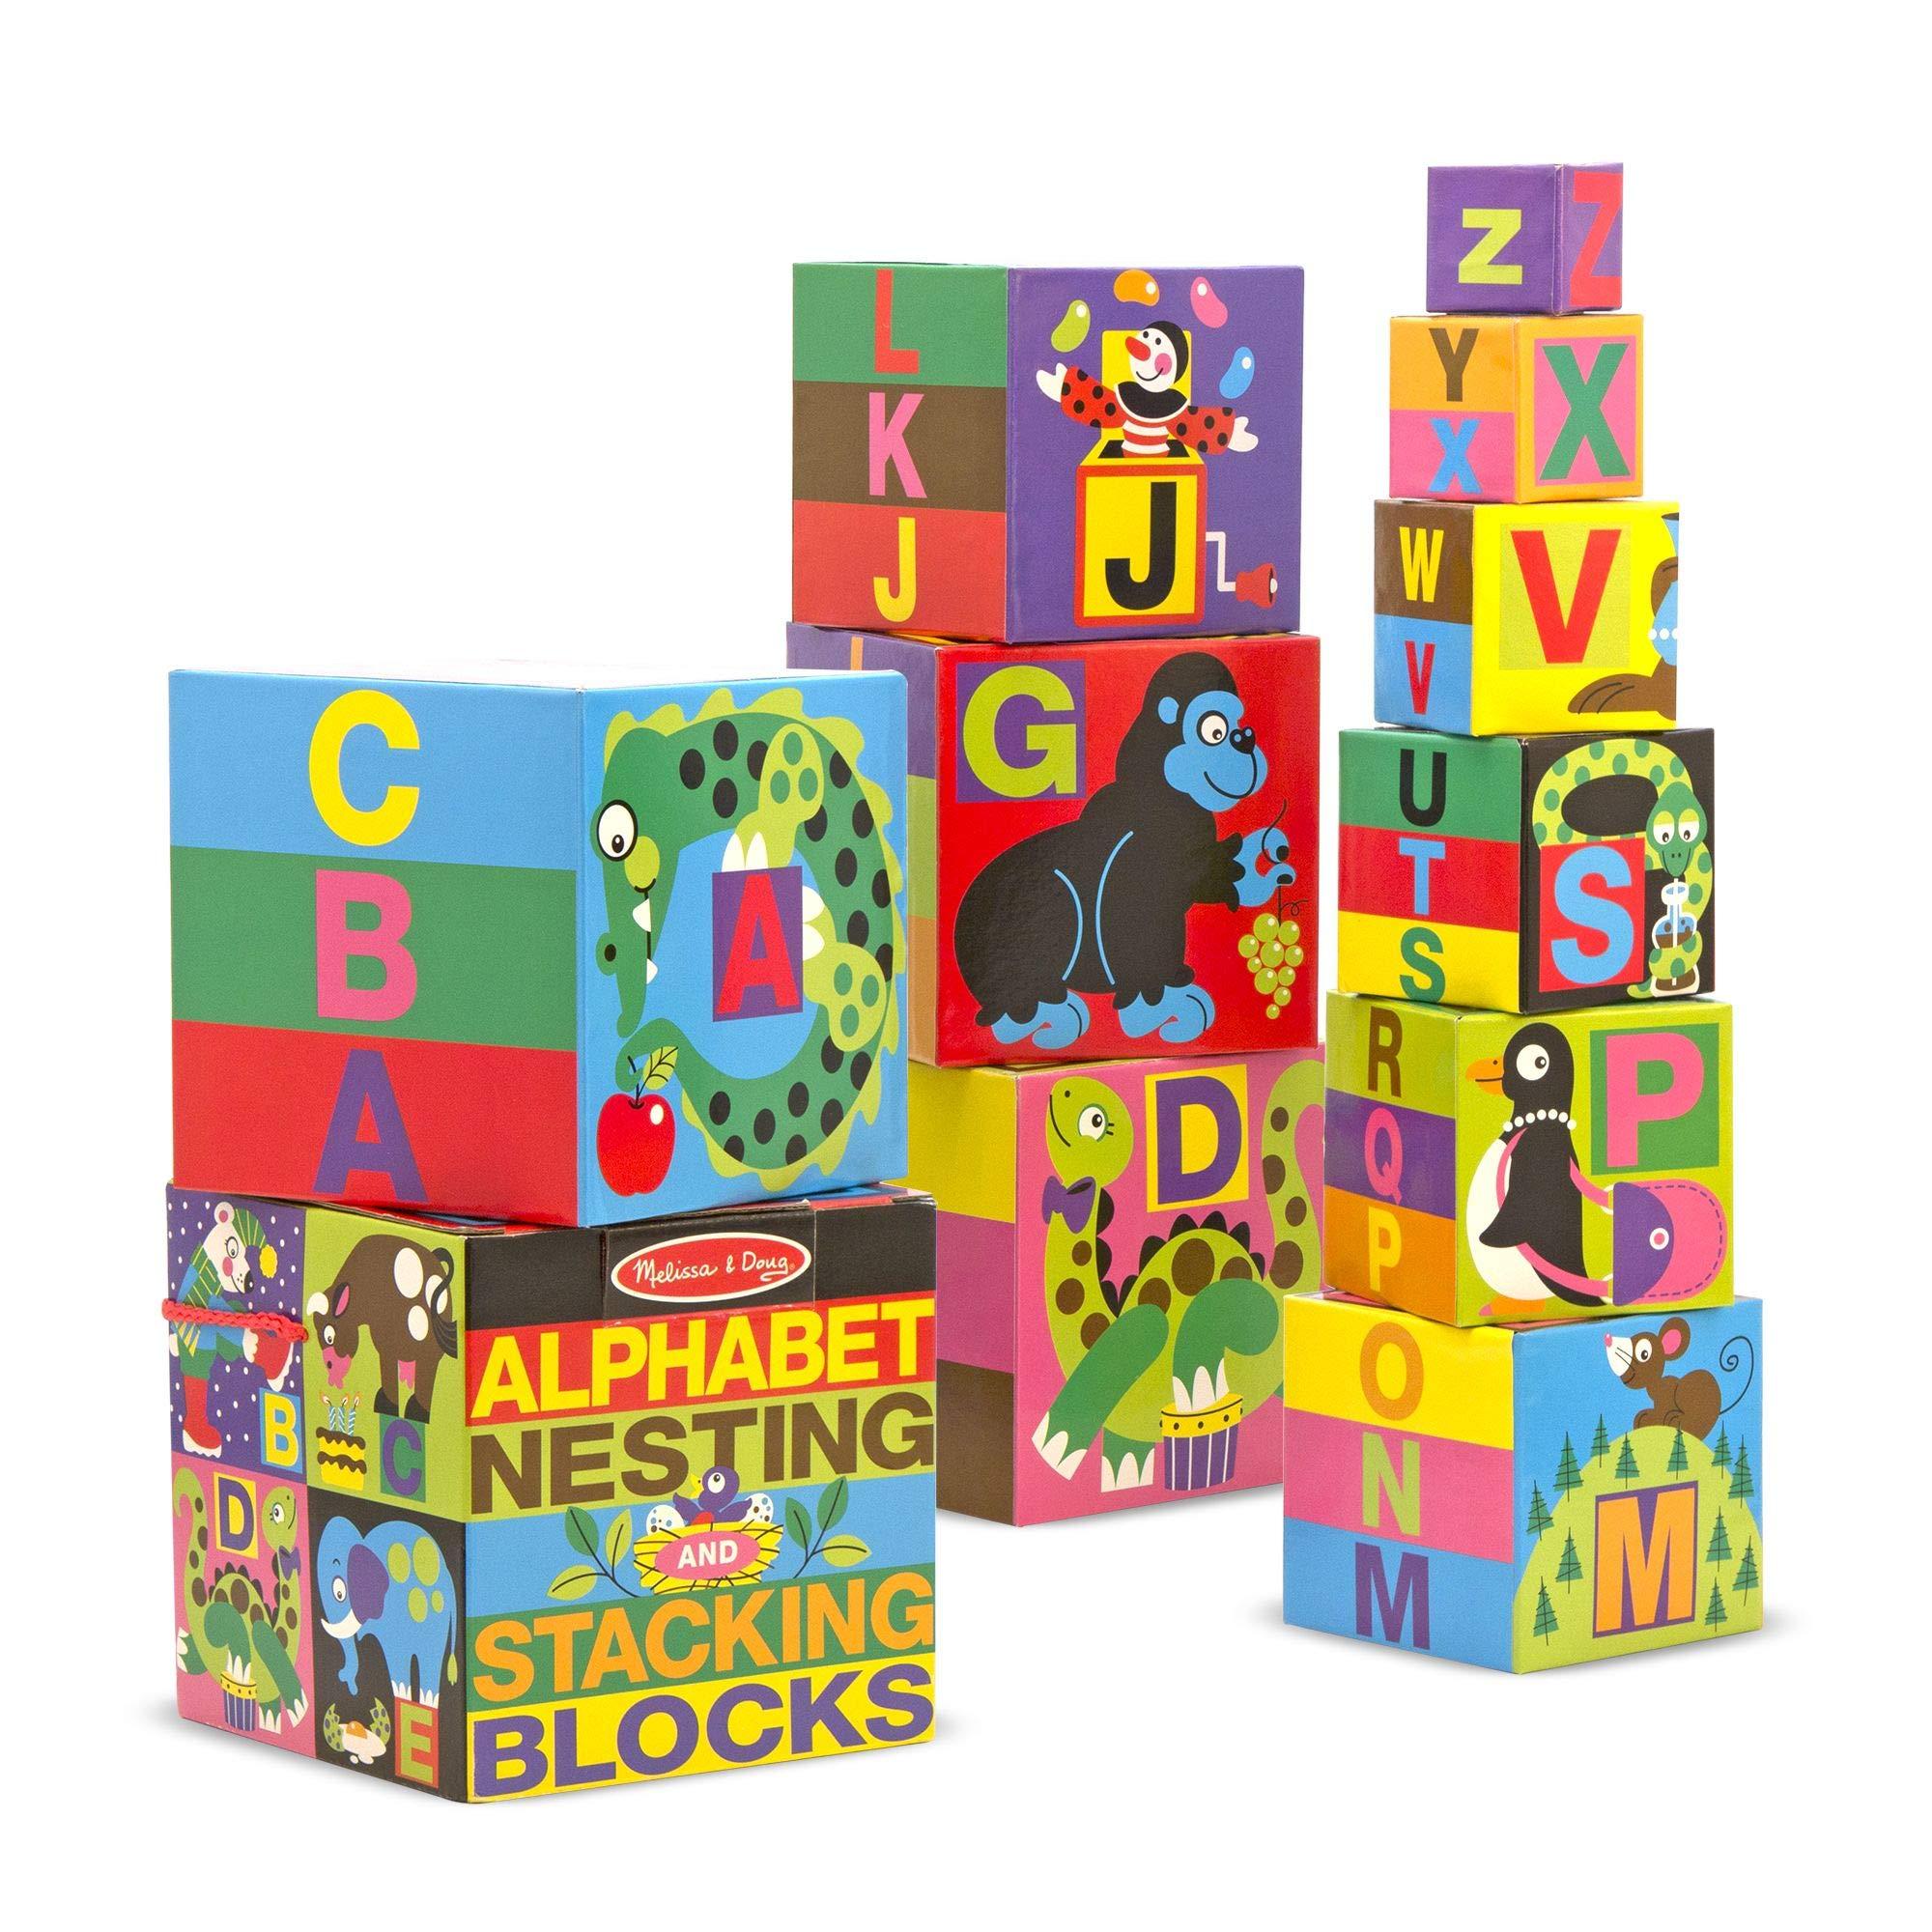 Melissa & Doug Alphabet Nesting and Stacking Blocks, Developmental Toys, Easy Storage, Durable Construction, 10 Cardboard Nesting Boxes, 5.9″ H × 5.9″ W × 5.9″ L